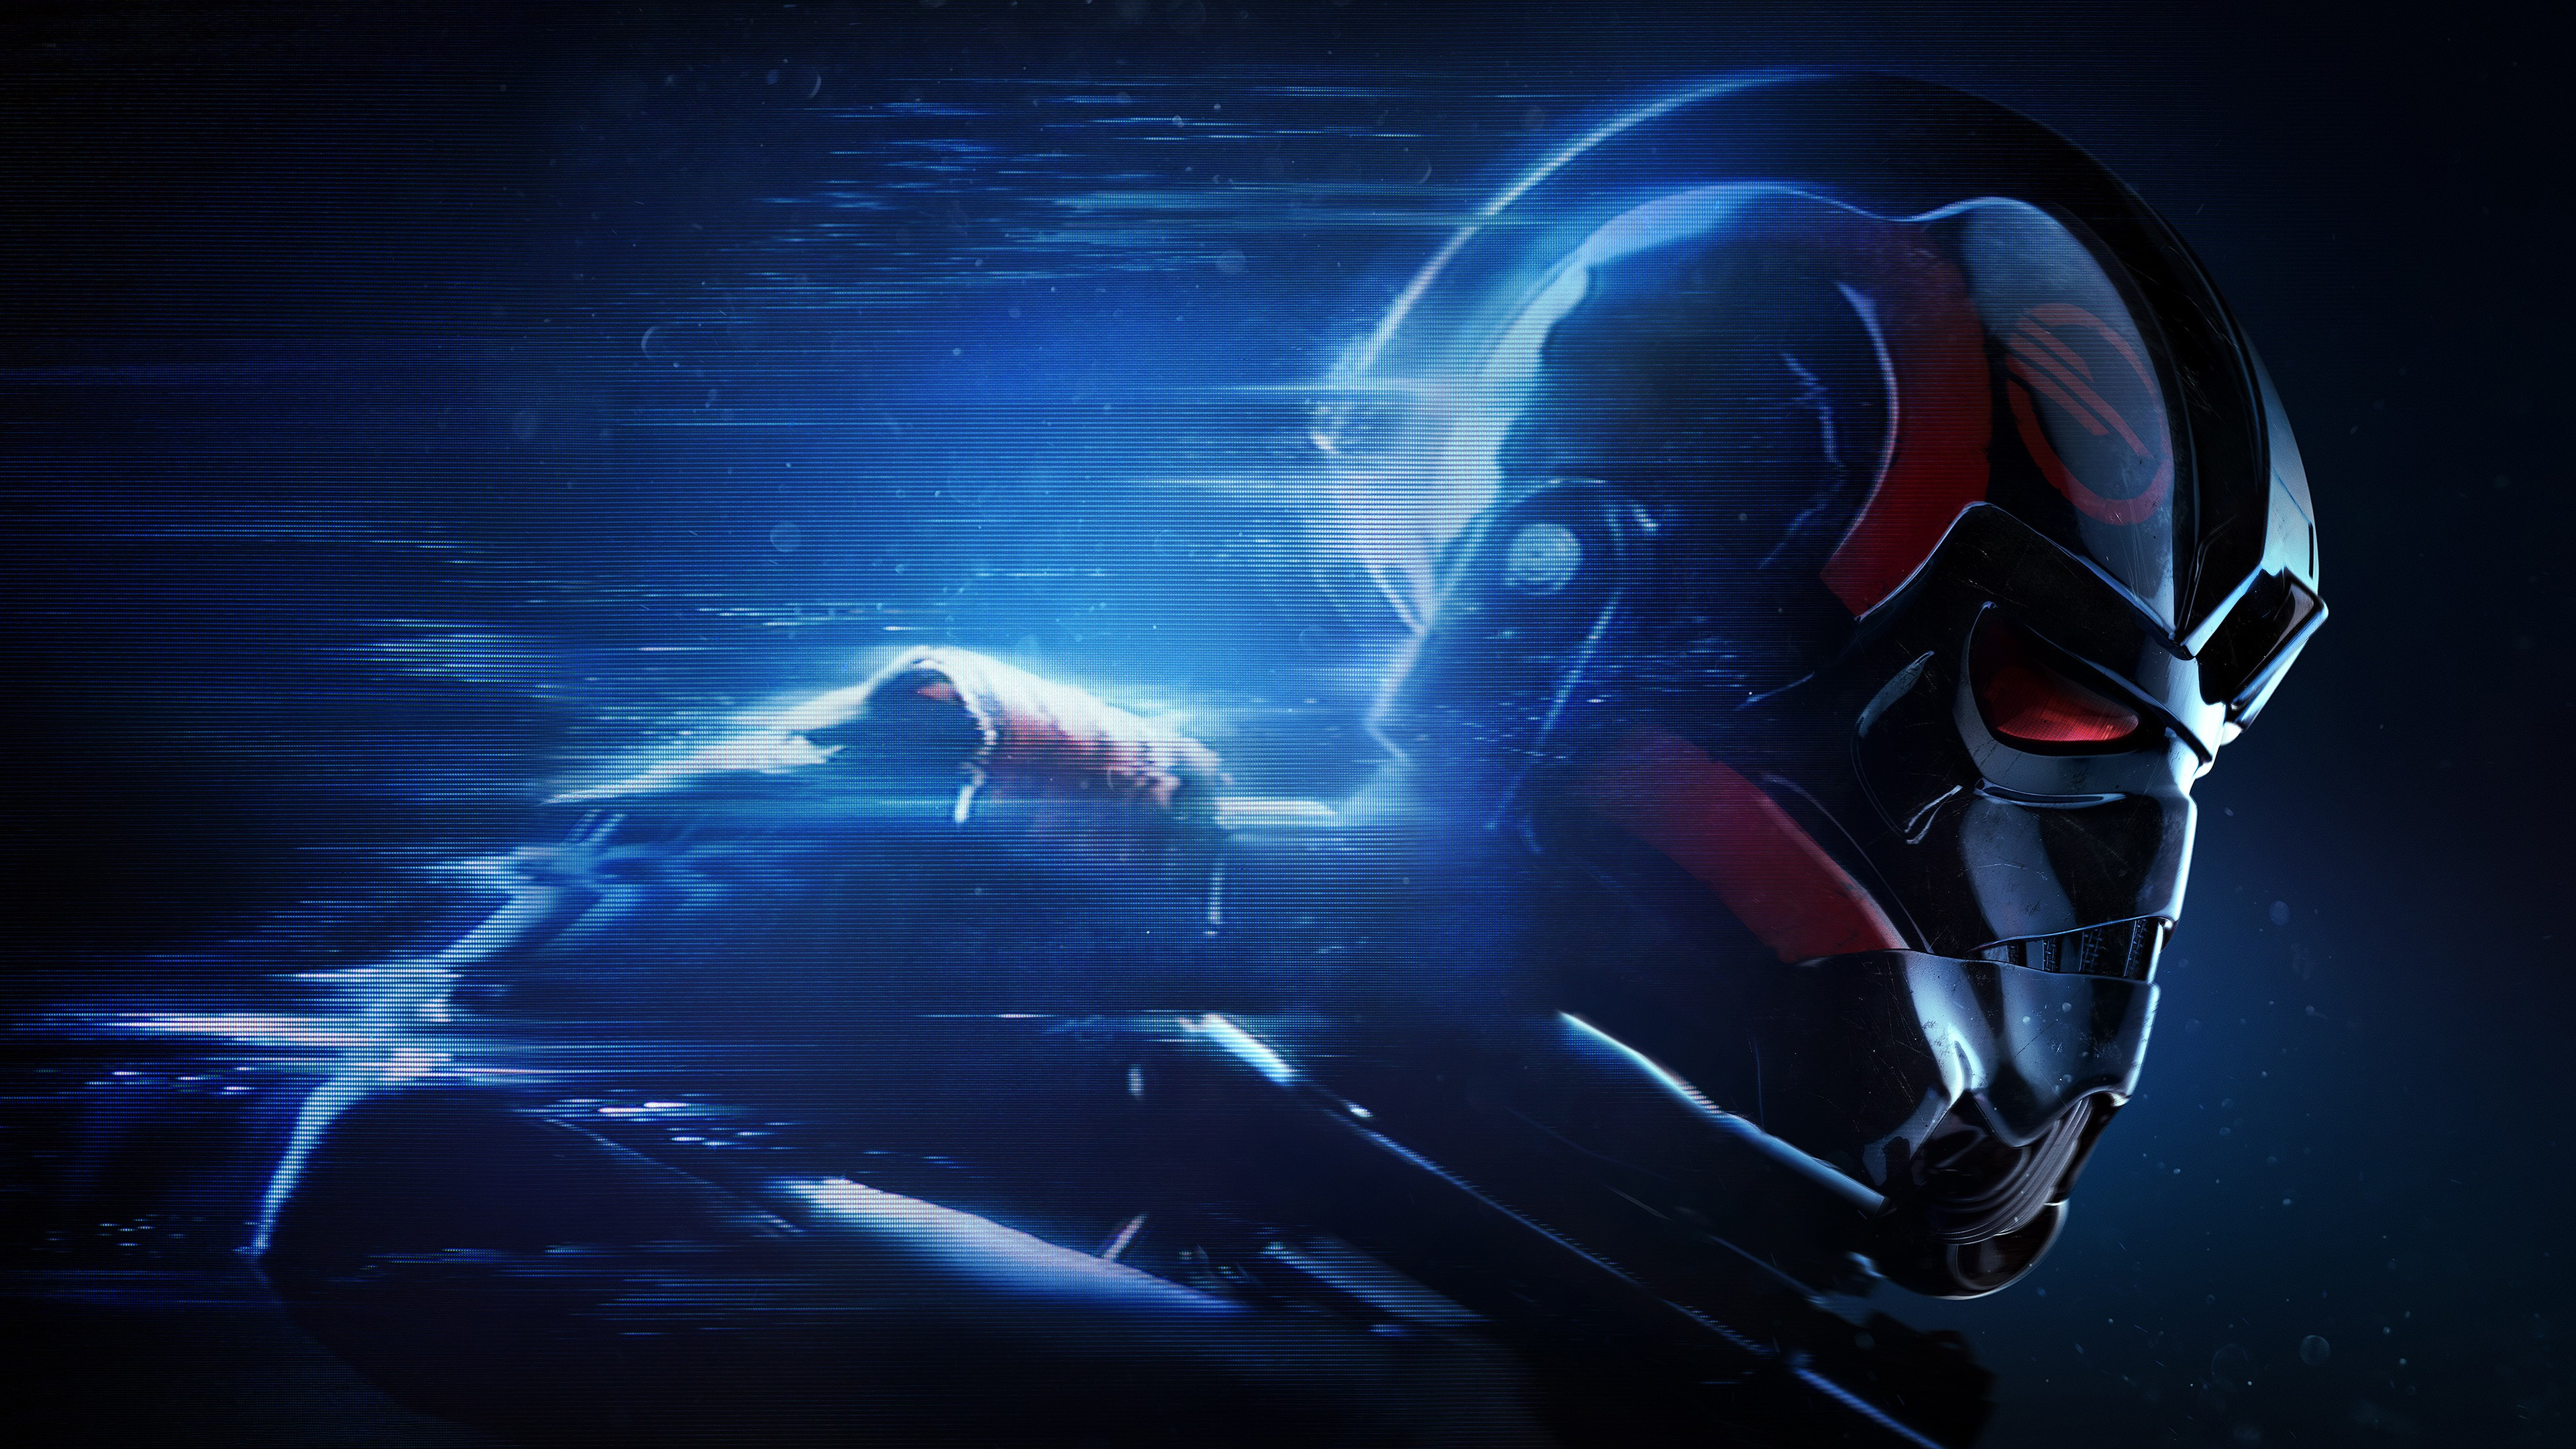 ОБЗОР STAR WARS: BATTLEFRONT 2